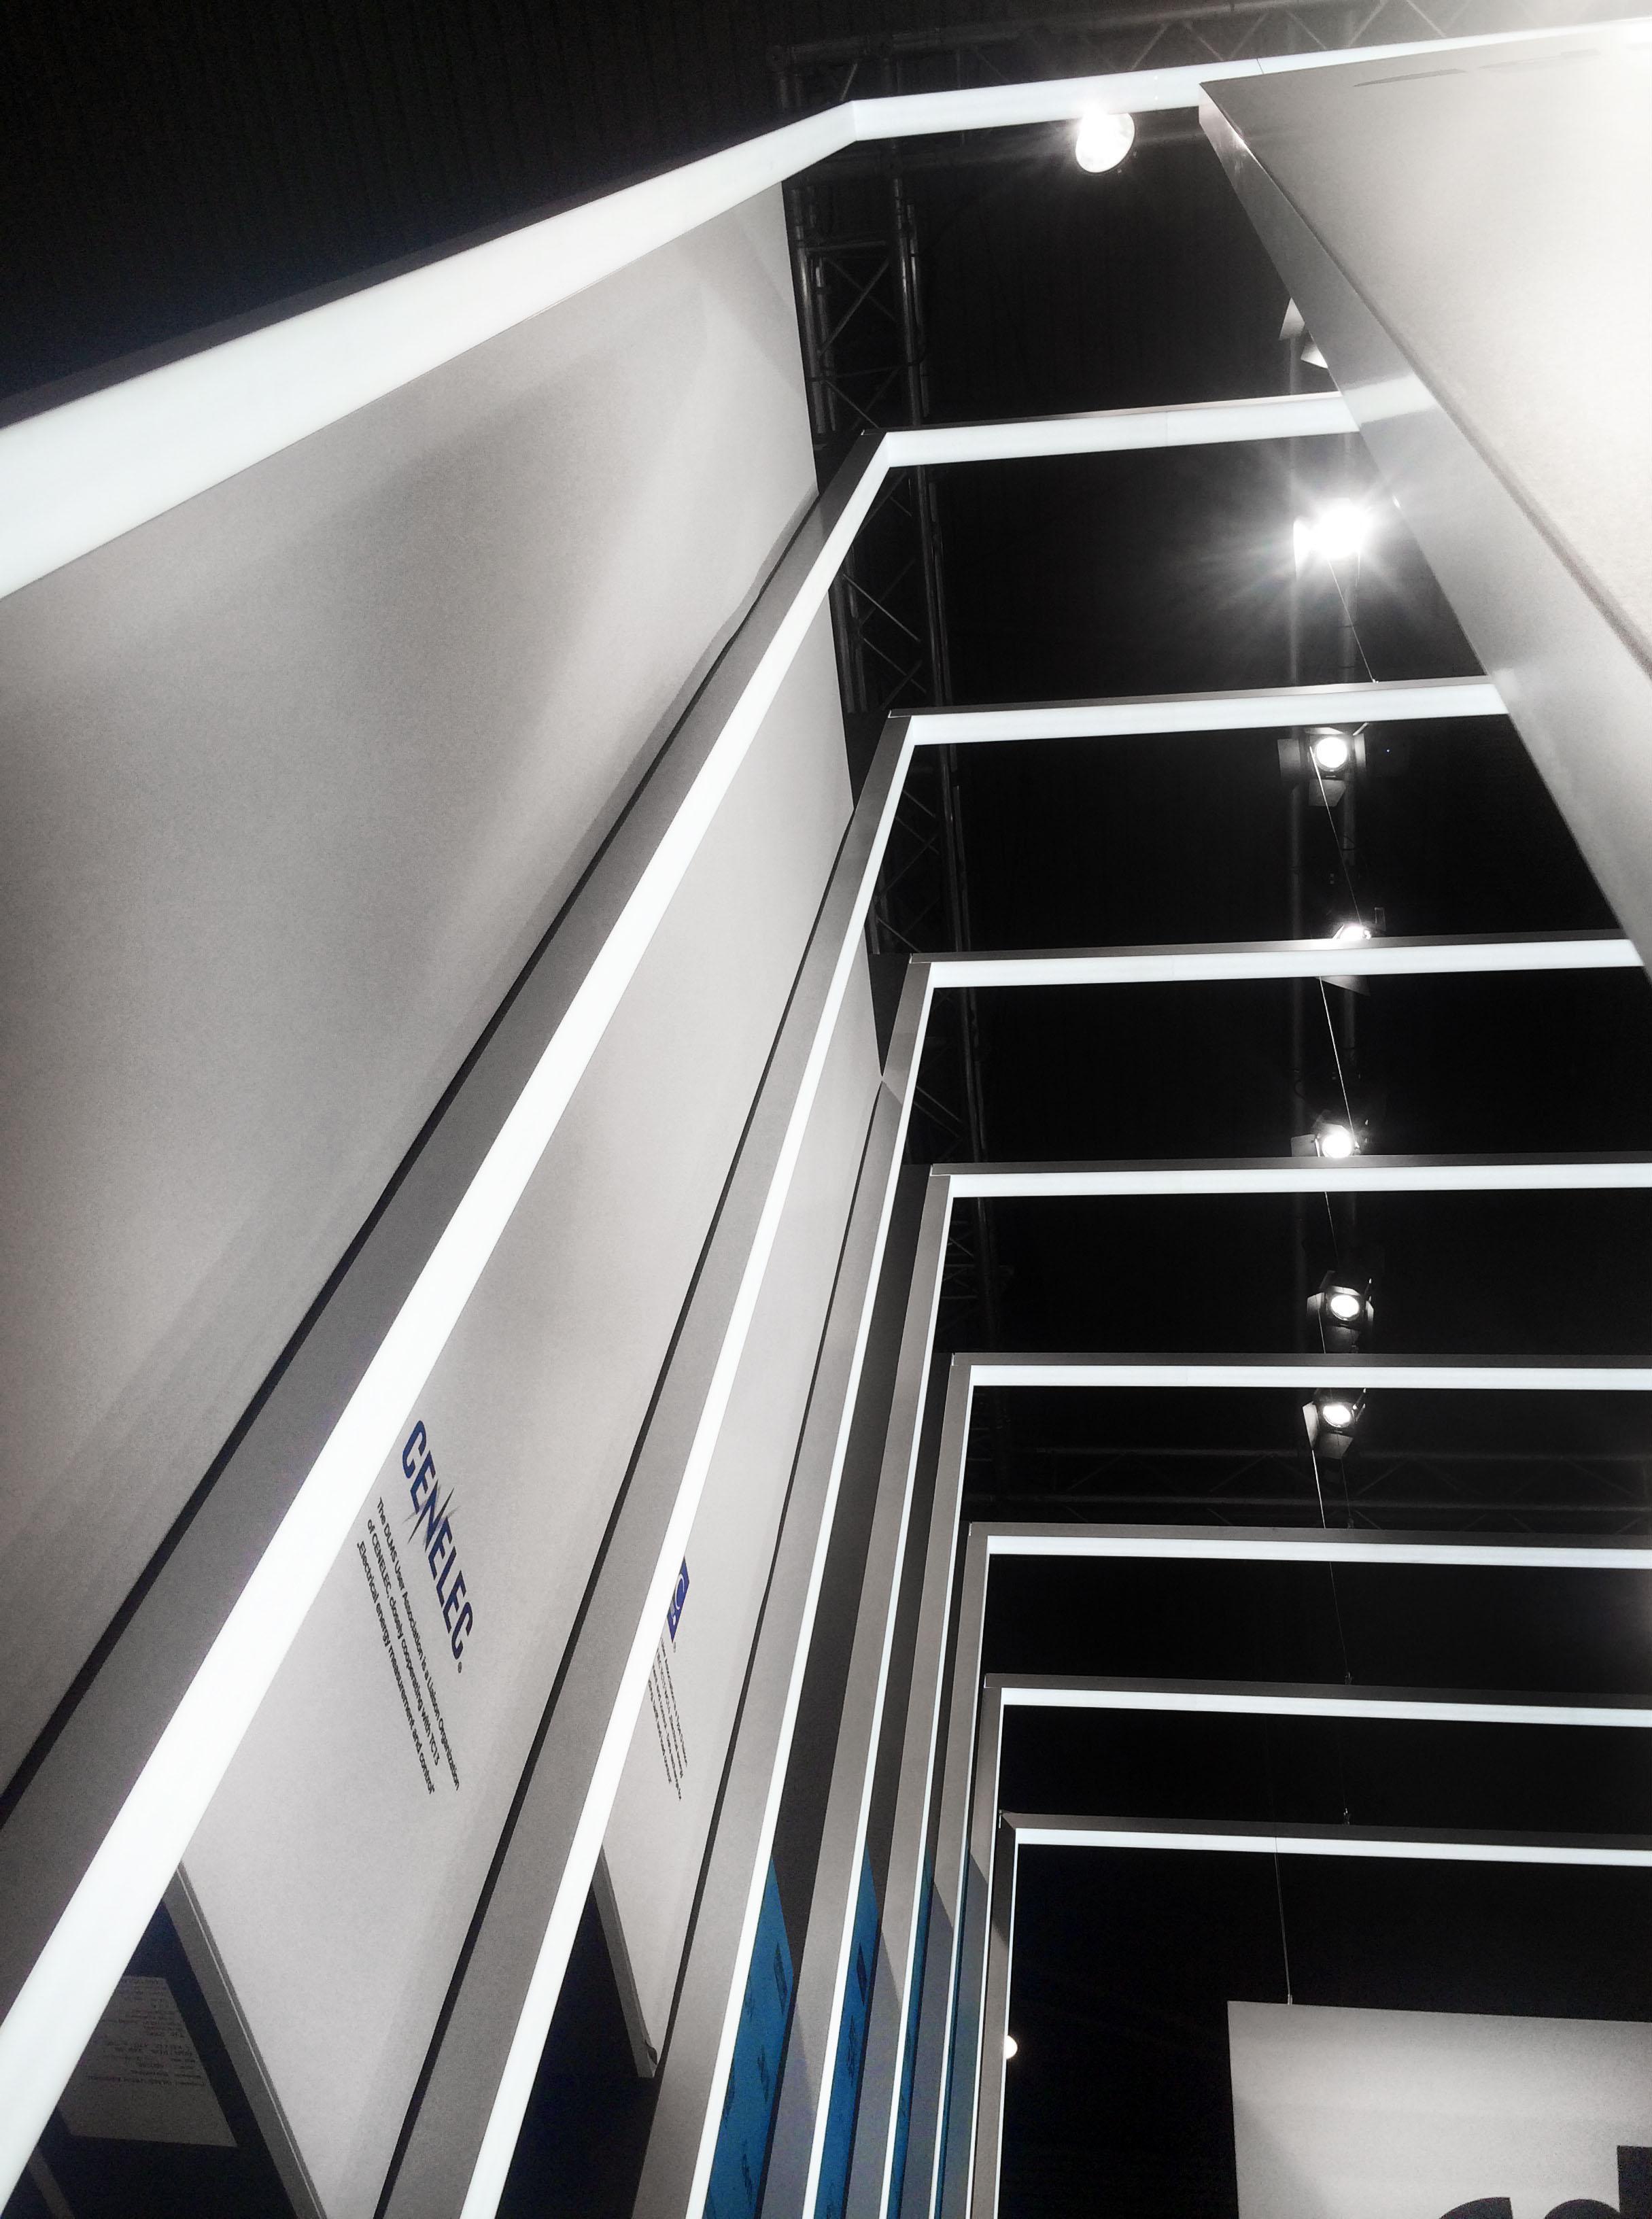 dlms_tradefair-exhibition-design_coordination-berlin_04.jpg